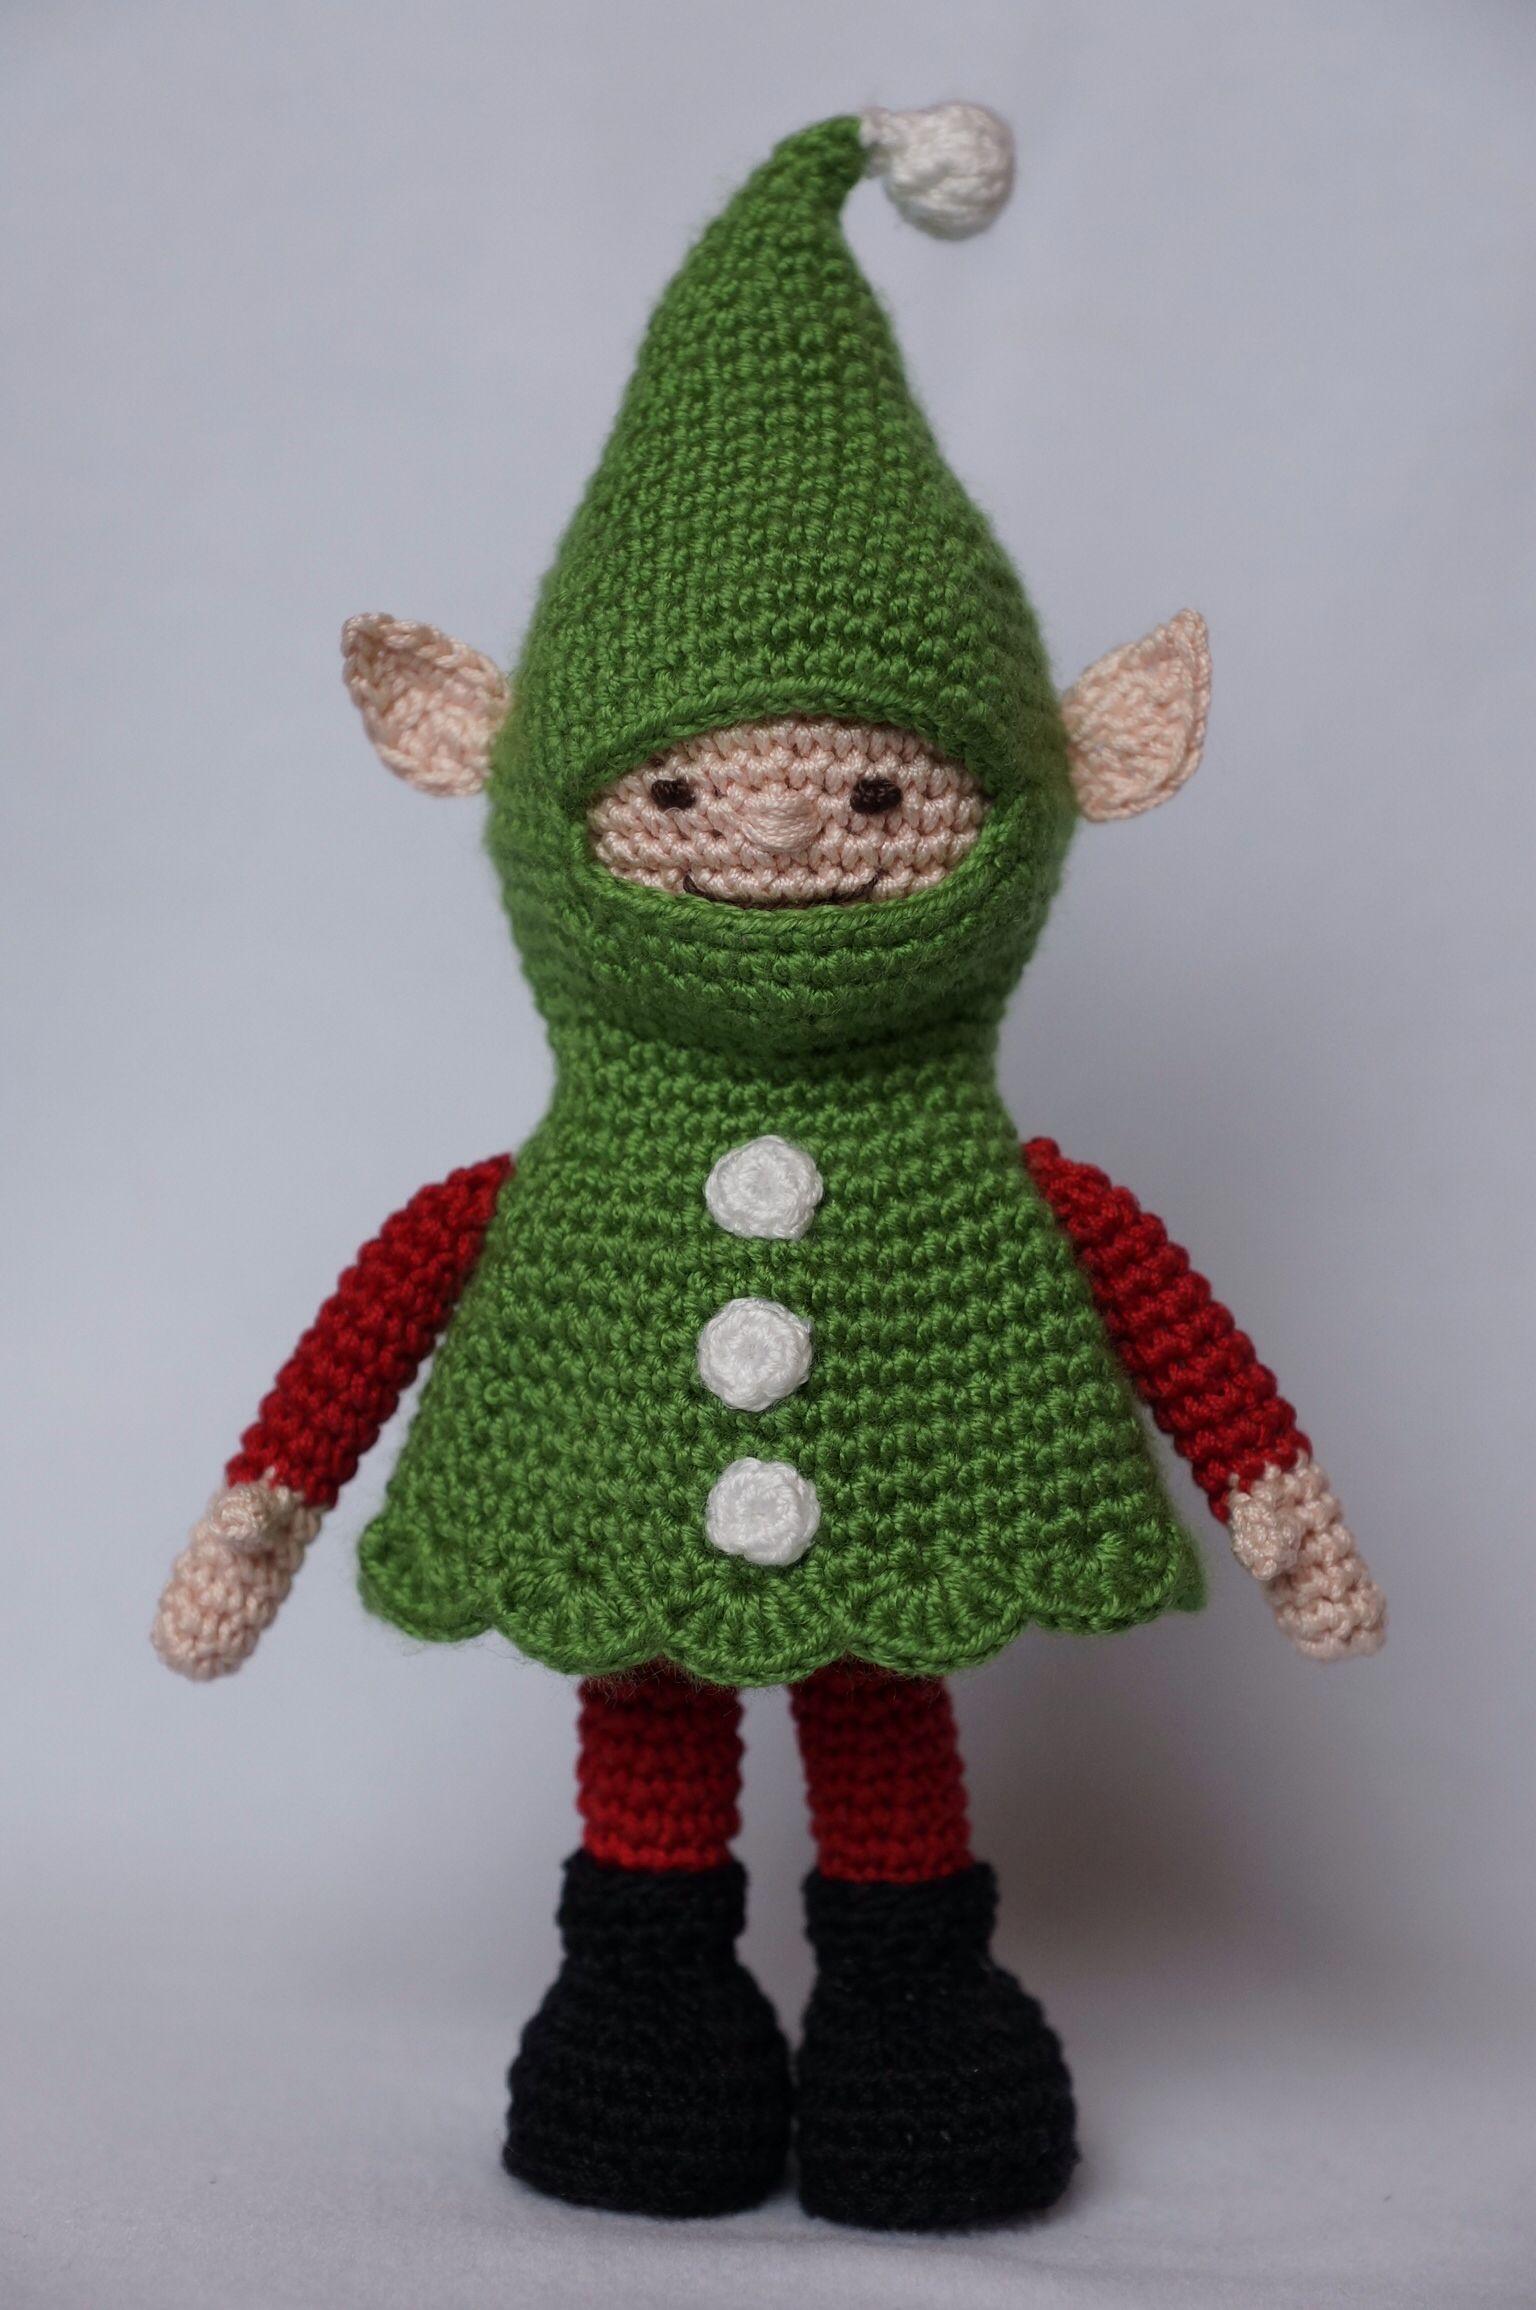 Amigurumi Gnome;) Crochet: Amigurumi Pinterest